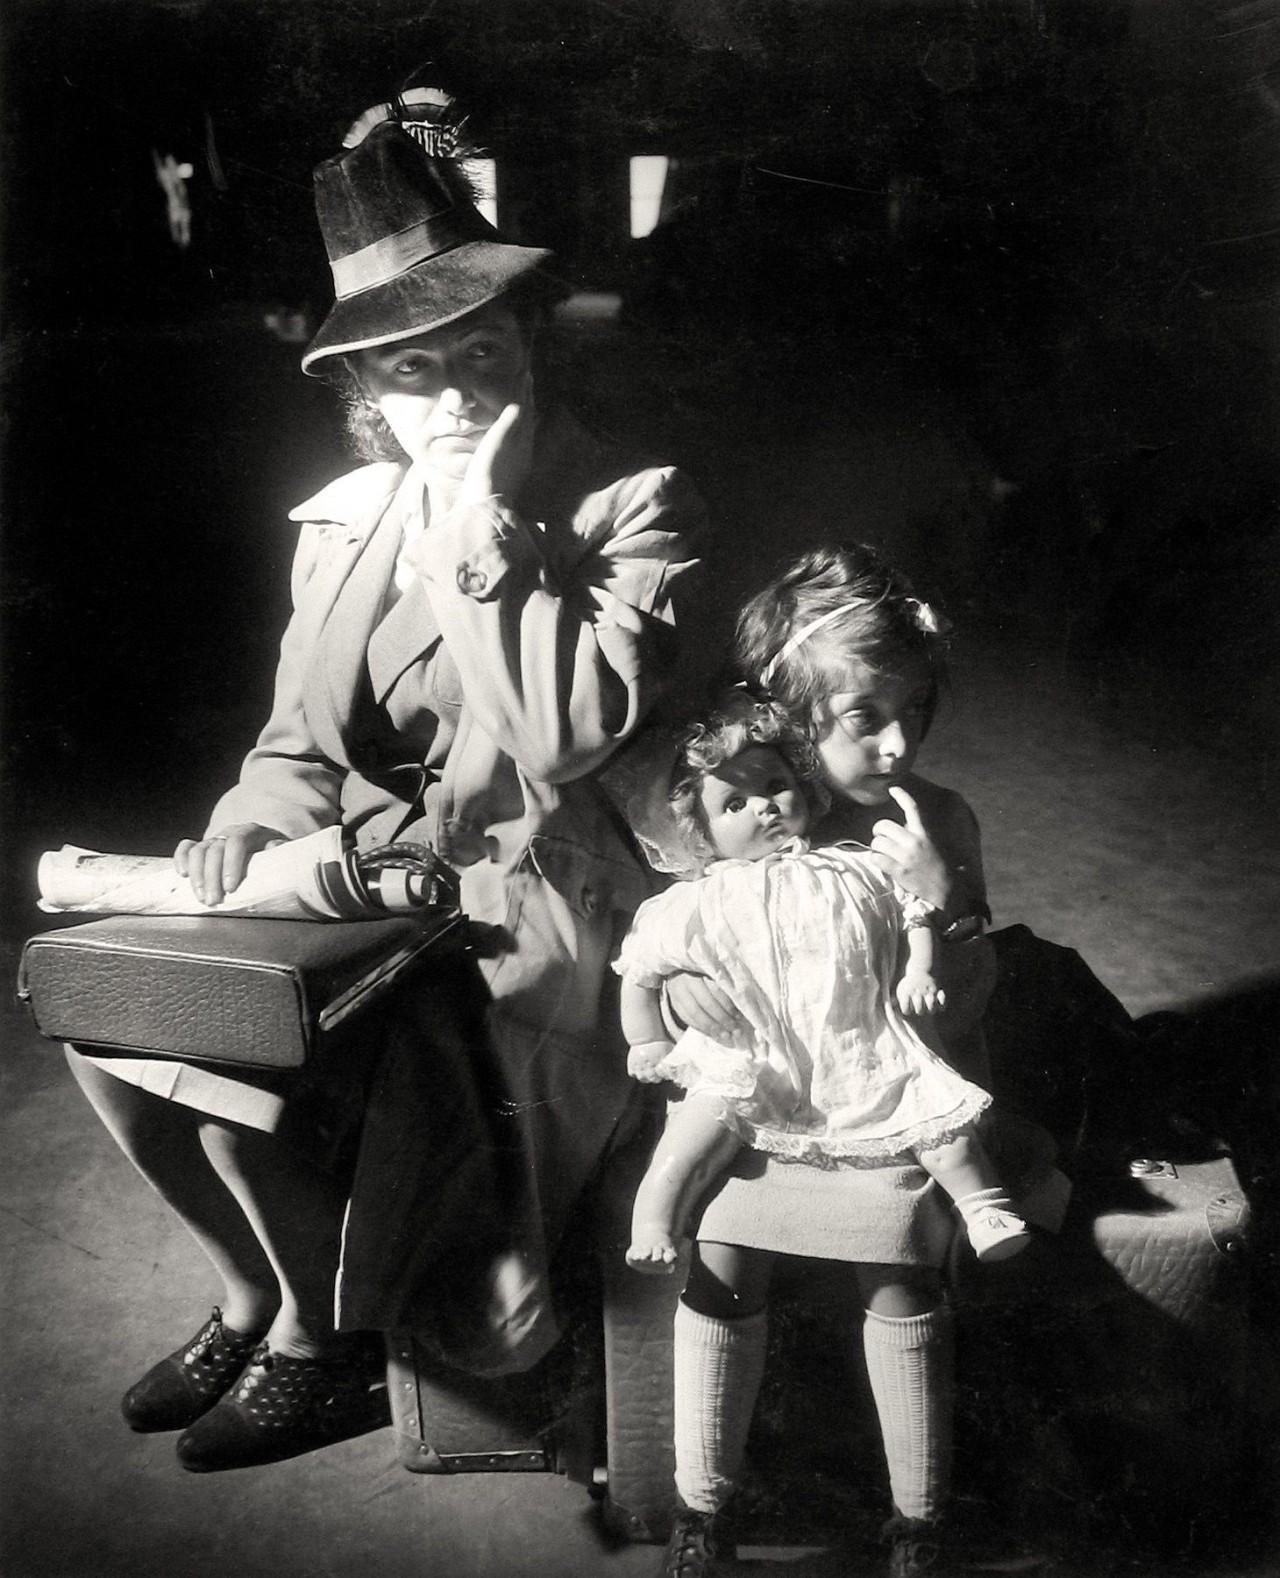 Иммигранты, 1941. Фотограф Эрих Кастан